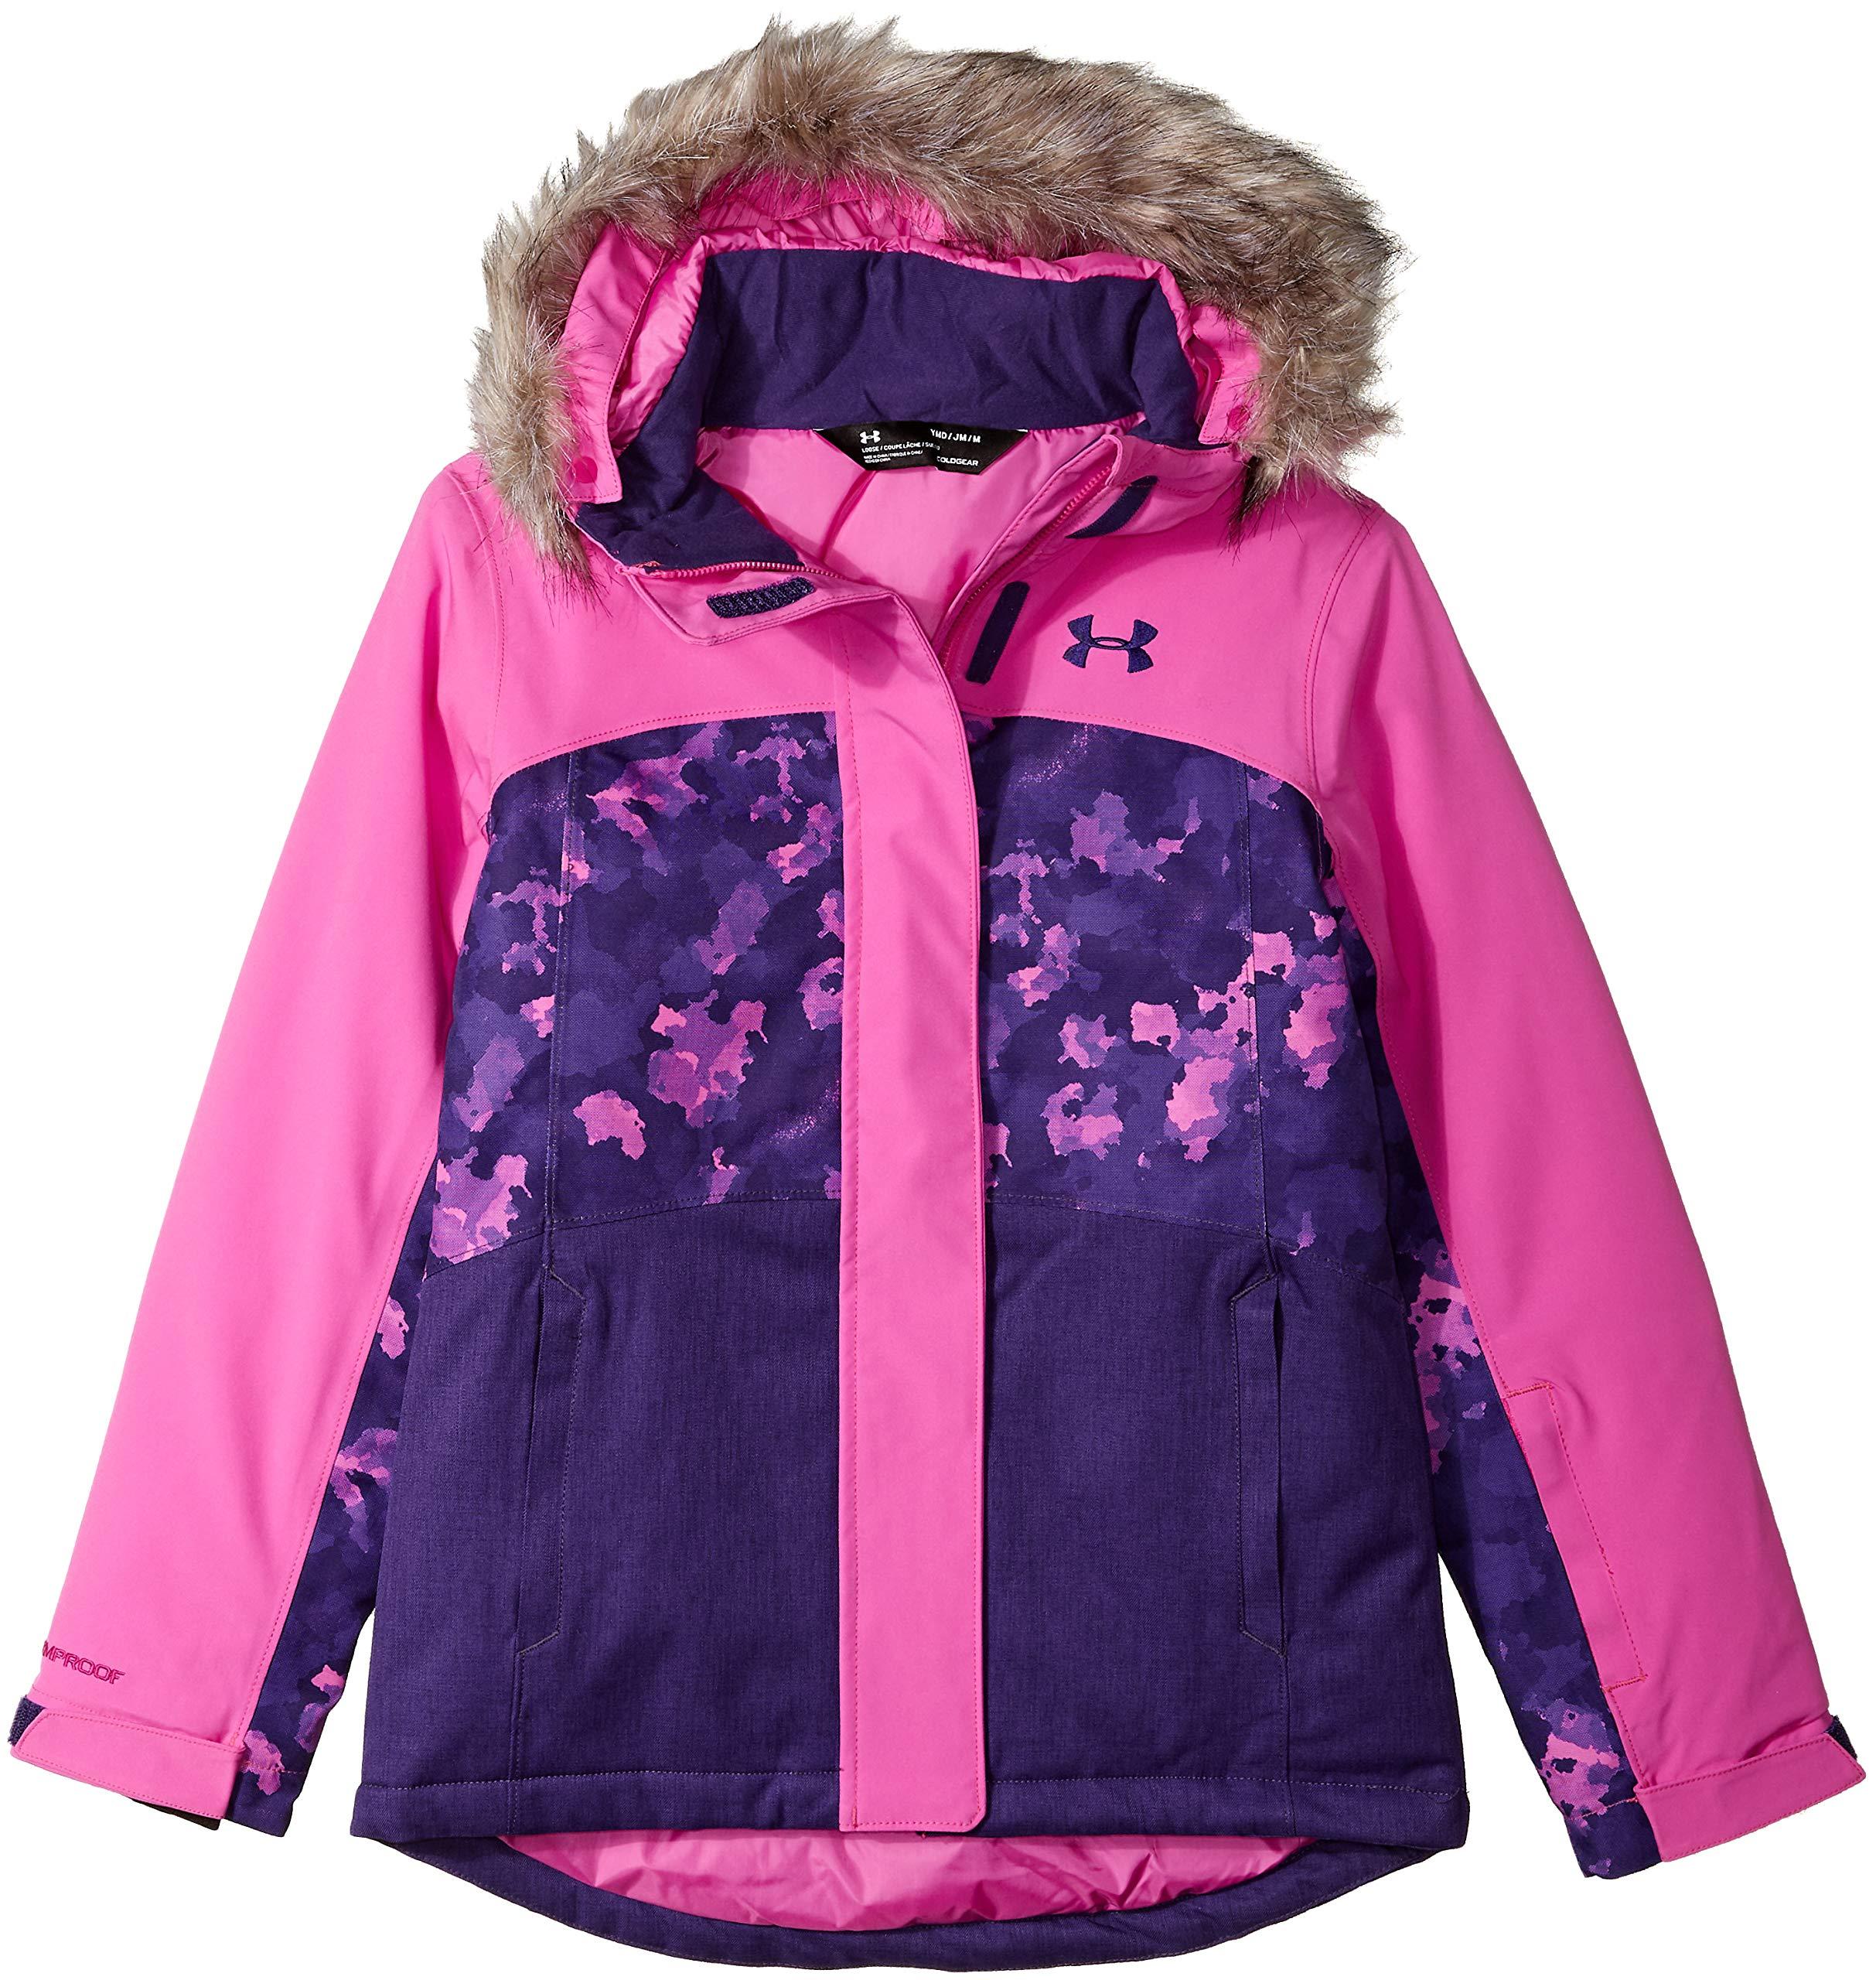 Under Armour Girls' Big ColdGear Max Altitude Ski Jacket, Flour Fuchsia with Fur, Small (7) by Under Armour